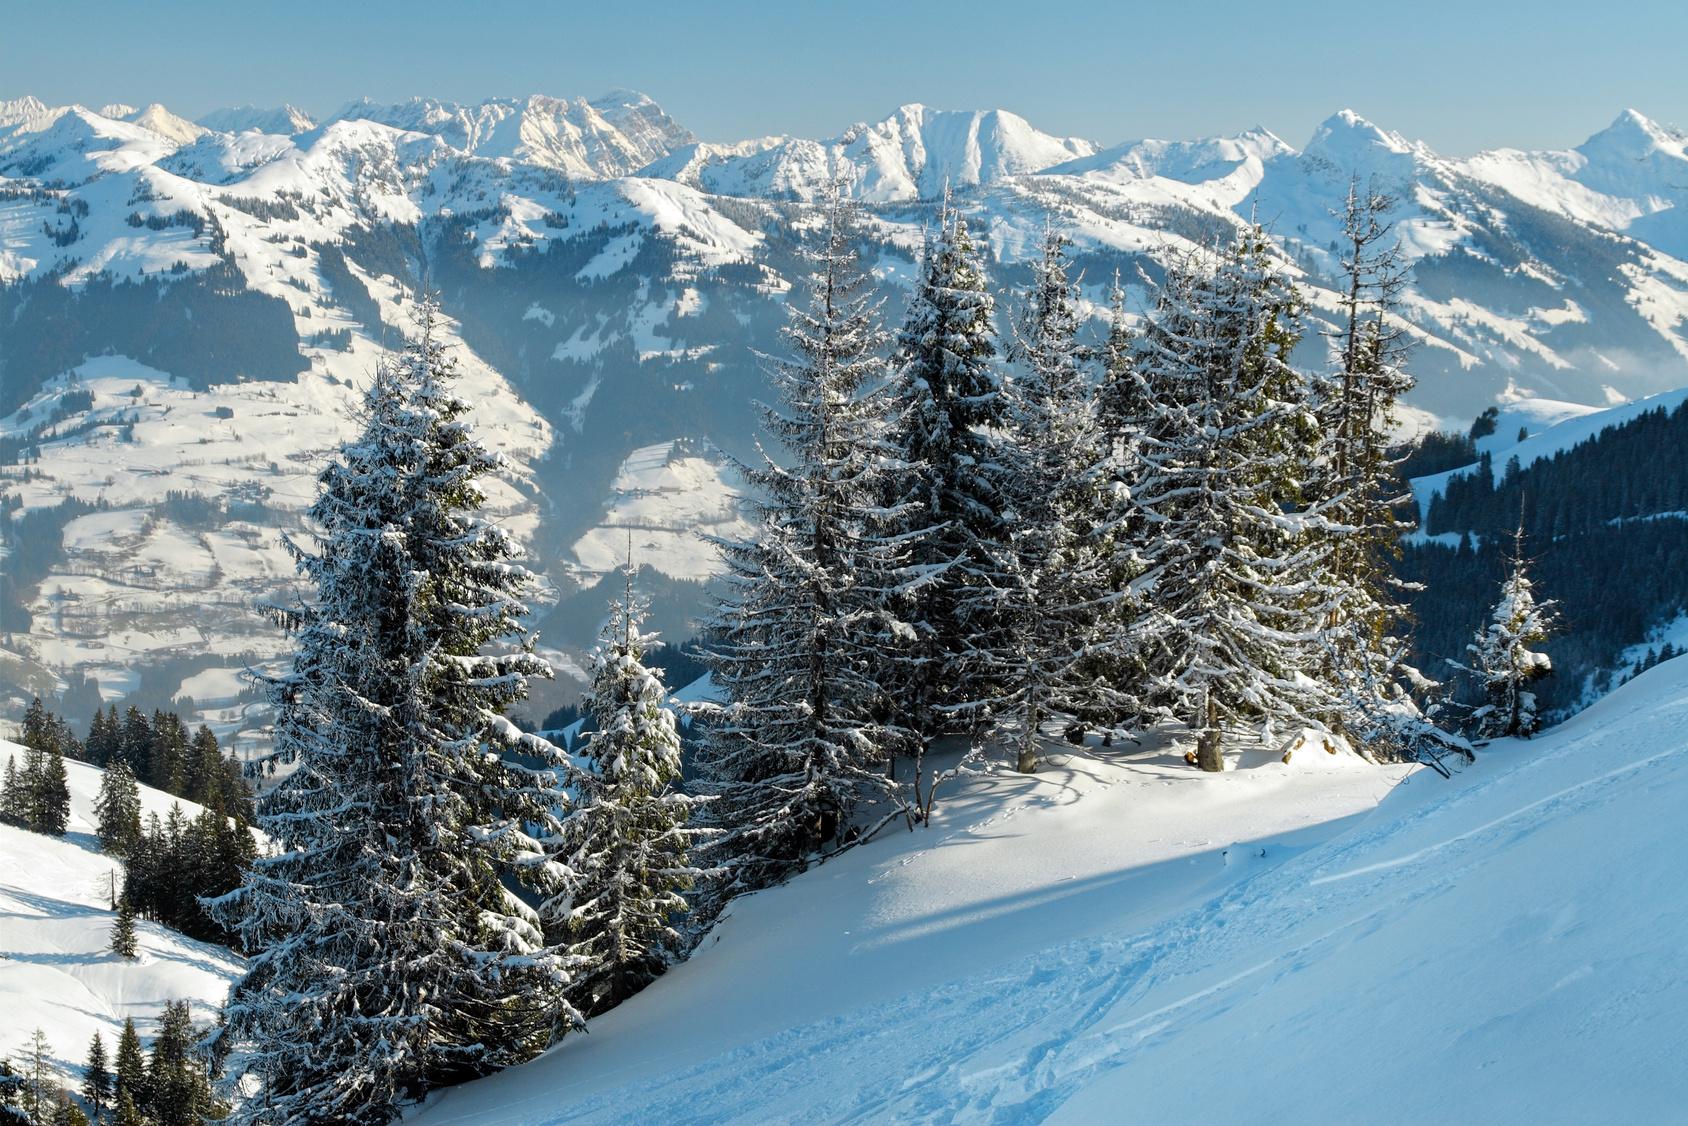 Schnee Winter Berge Alpen Ski